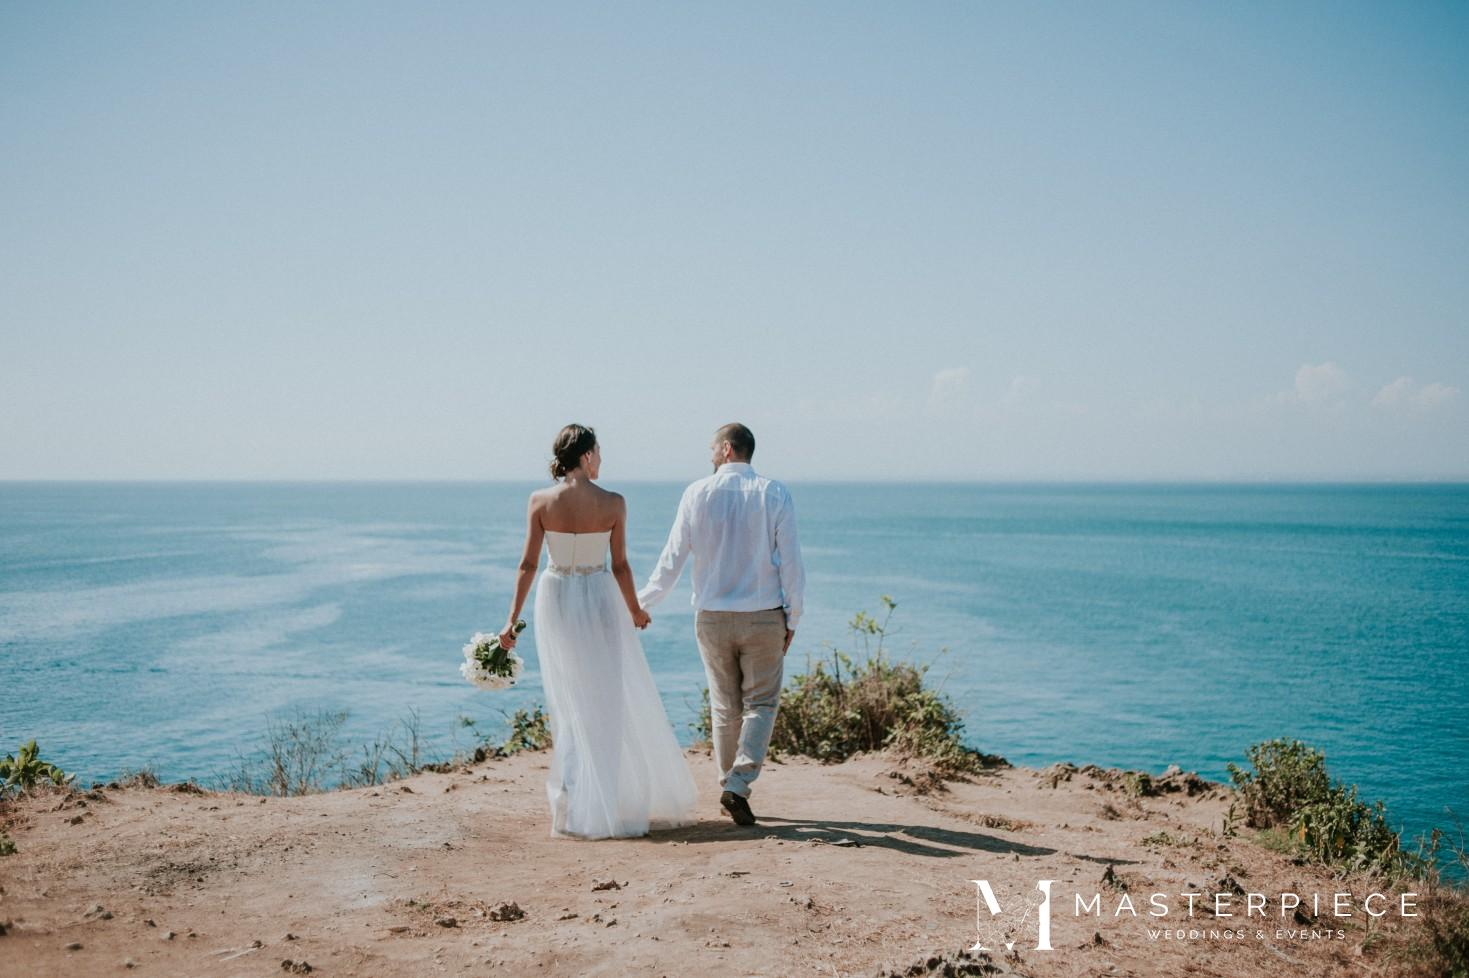 Masterpiece_Weddings_sluby_031